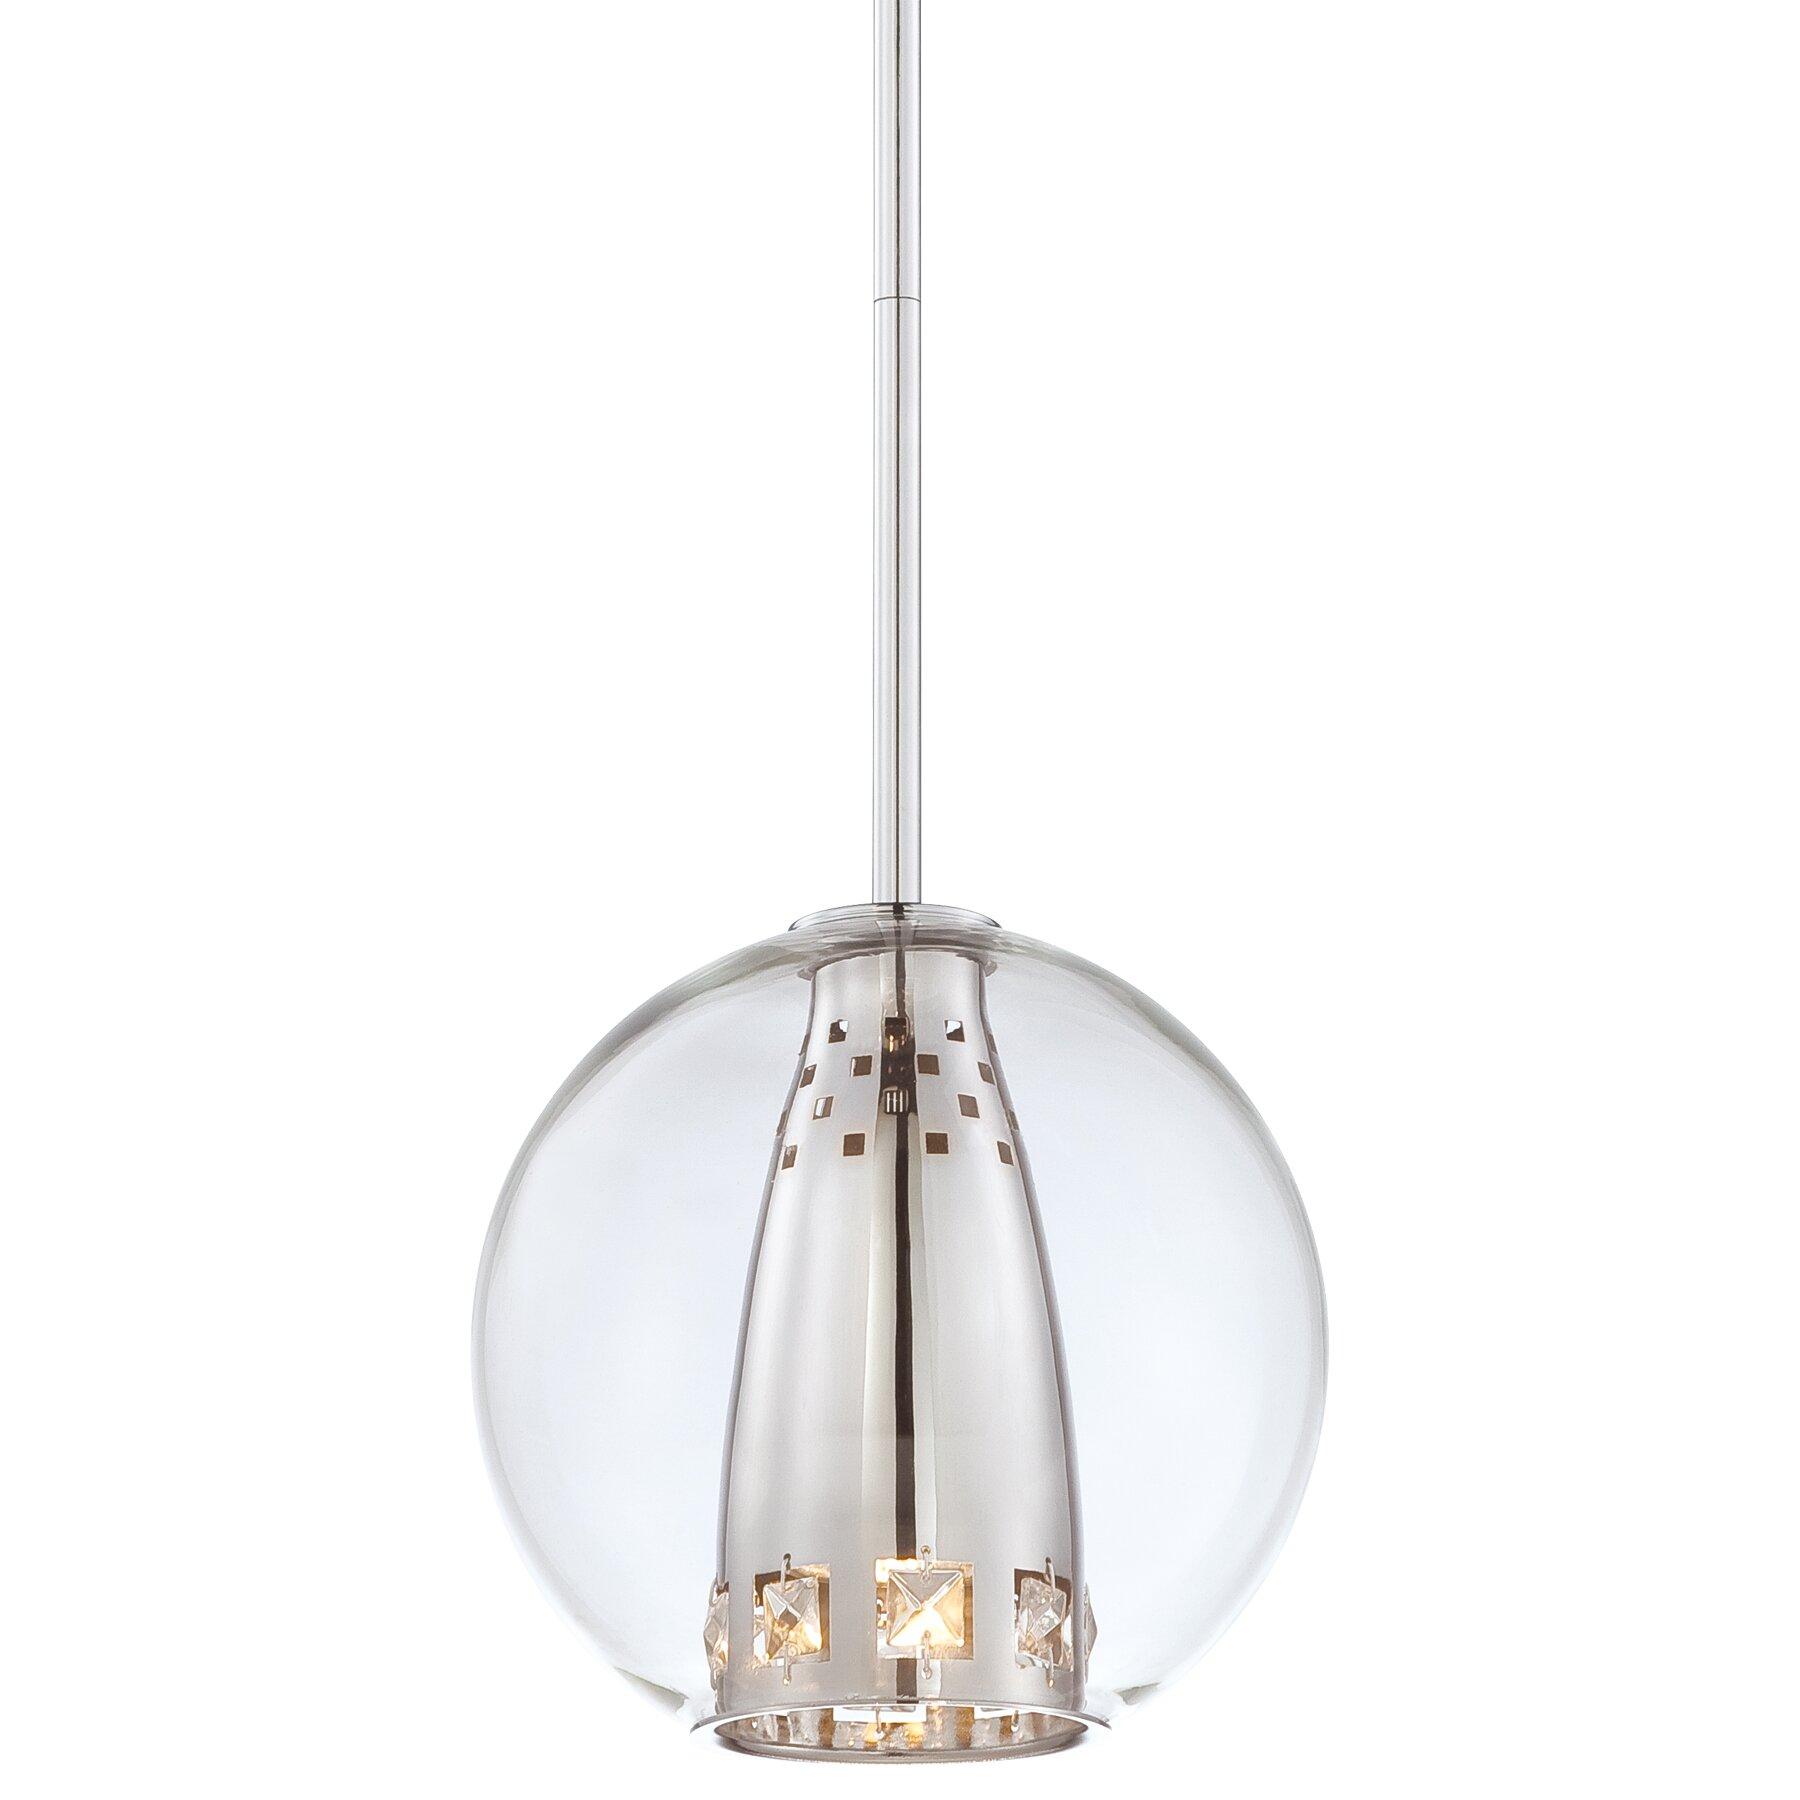 george kovacs bling bang 1 light globe mini pendant. Black Bedroom Furniture Sets. Home Design Ideas